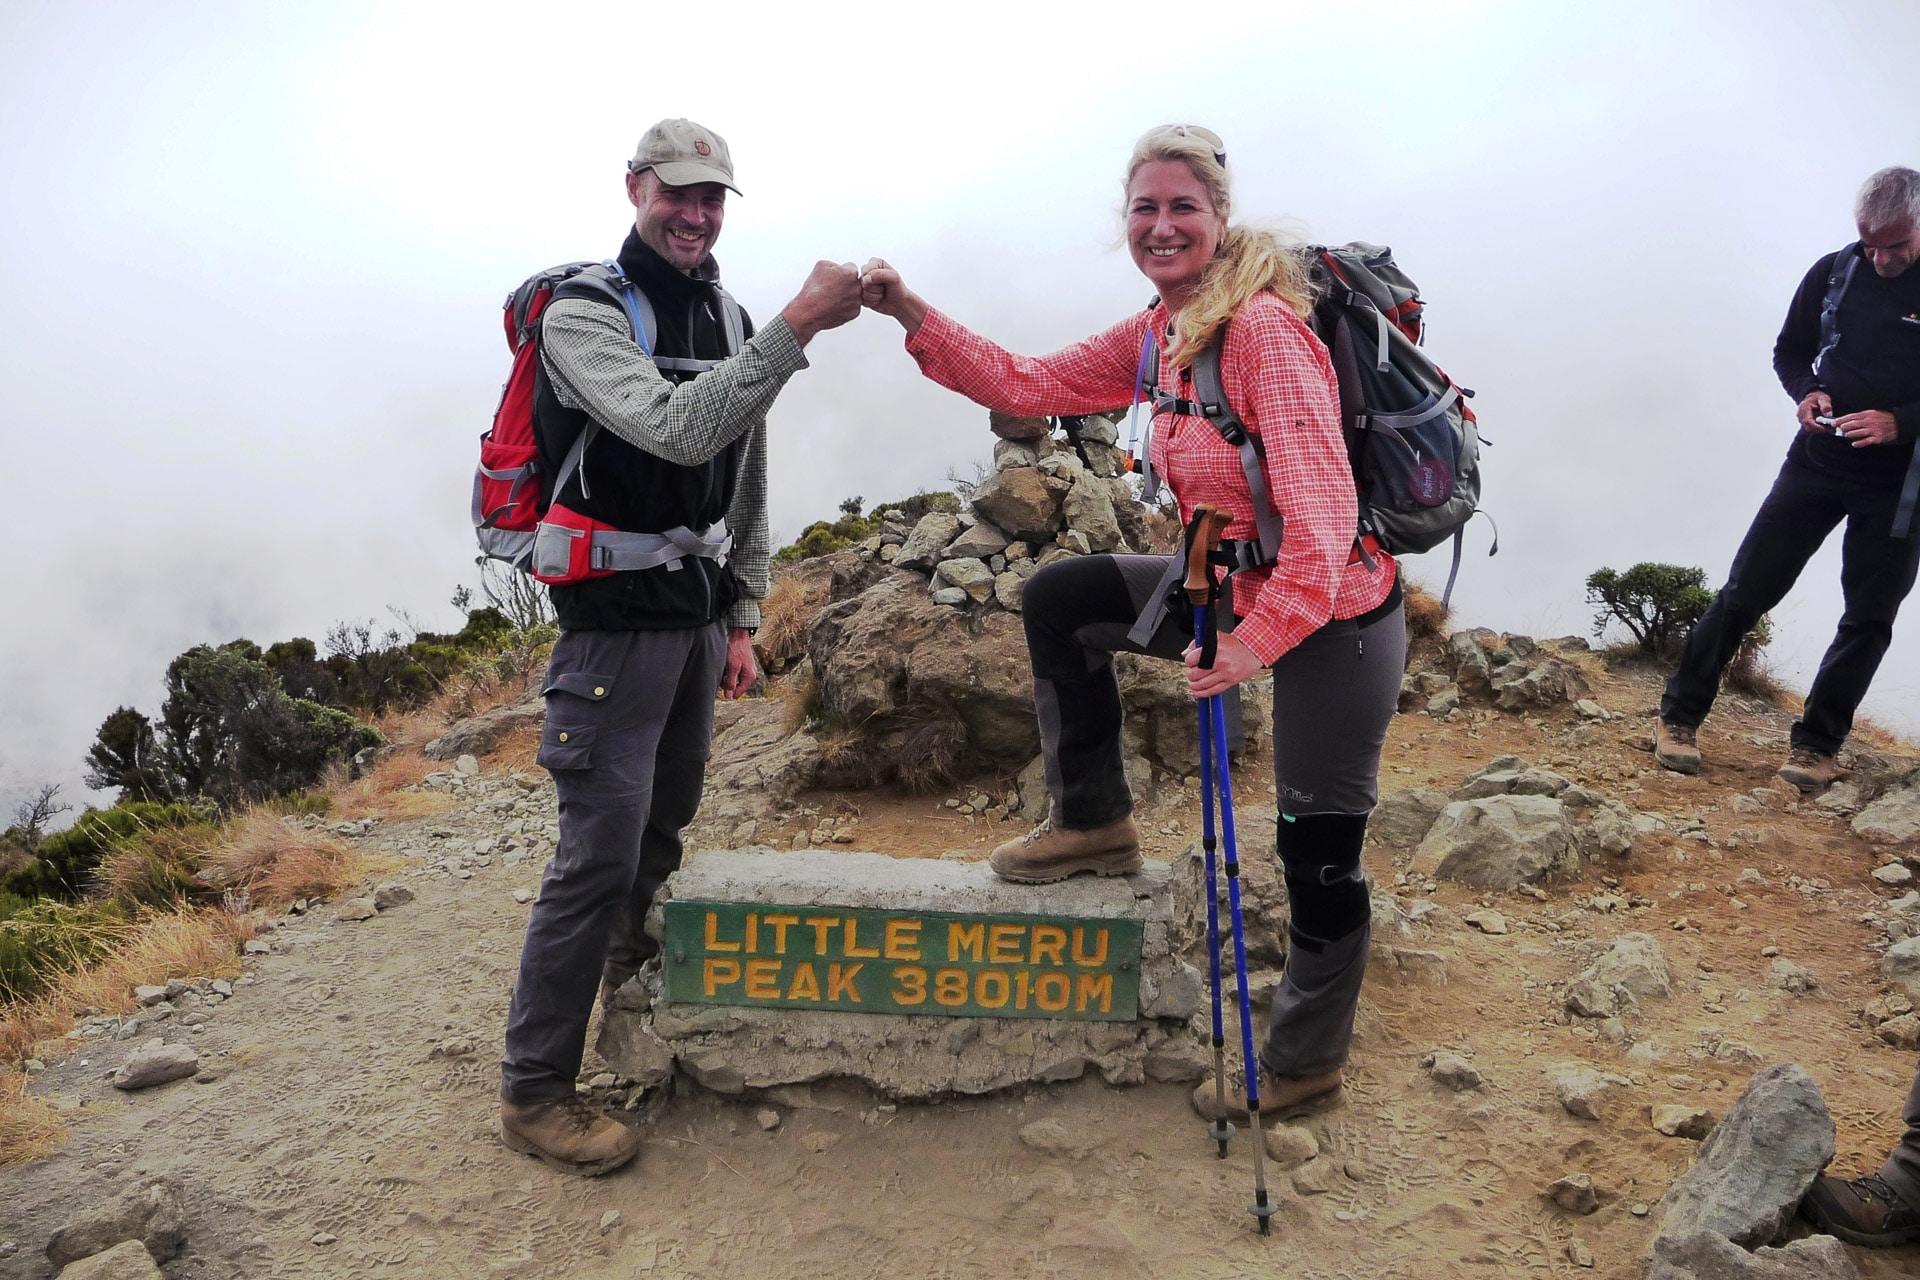 Mount-Meru-Arusha-Nationalpark-Tansania-Globetrotter-Select-Boehm-30